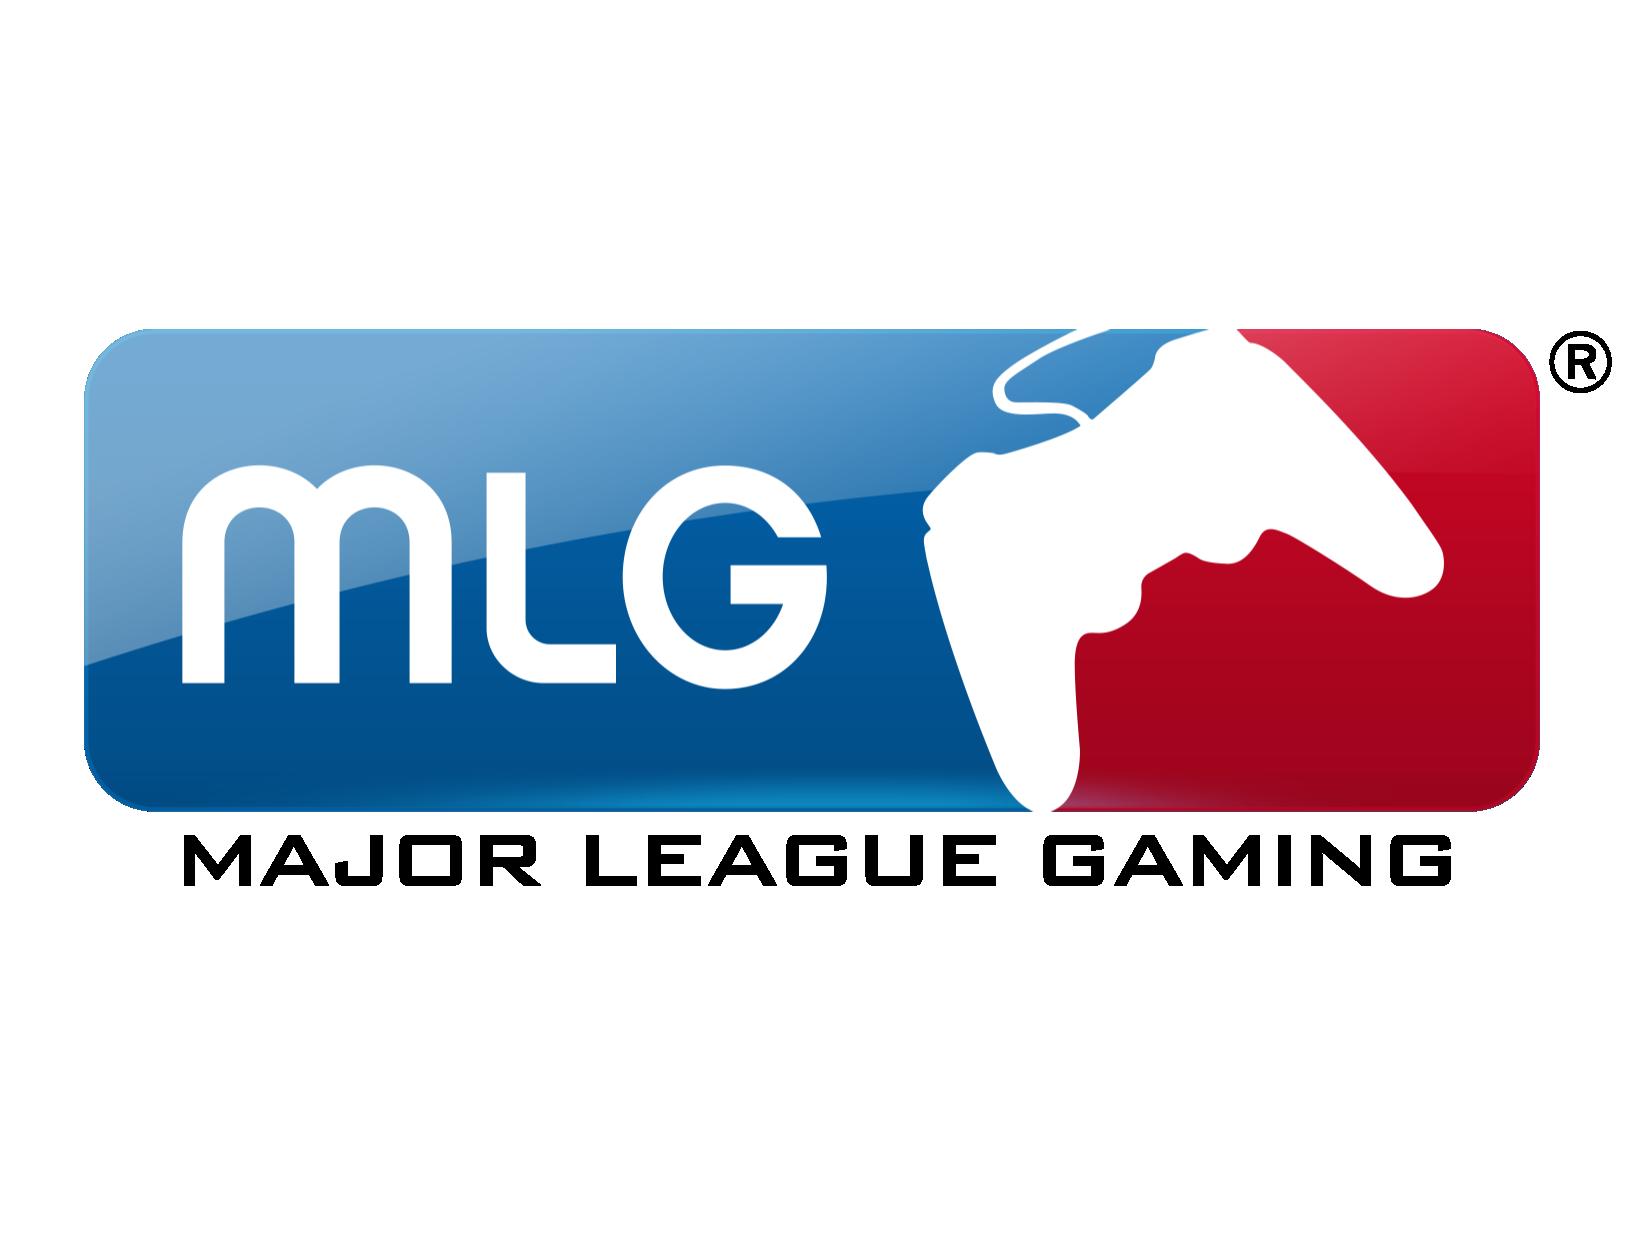 mlg logo Google Search Turtle beach, League gaming